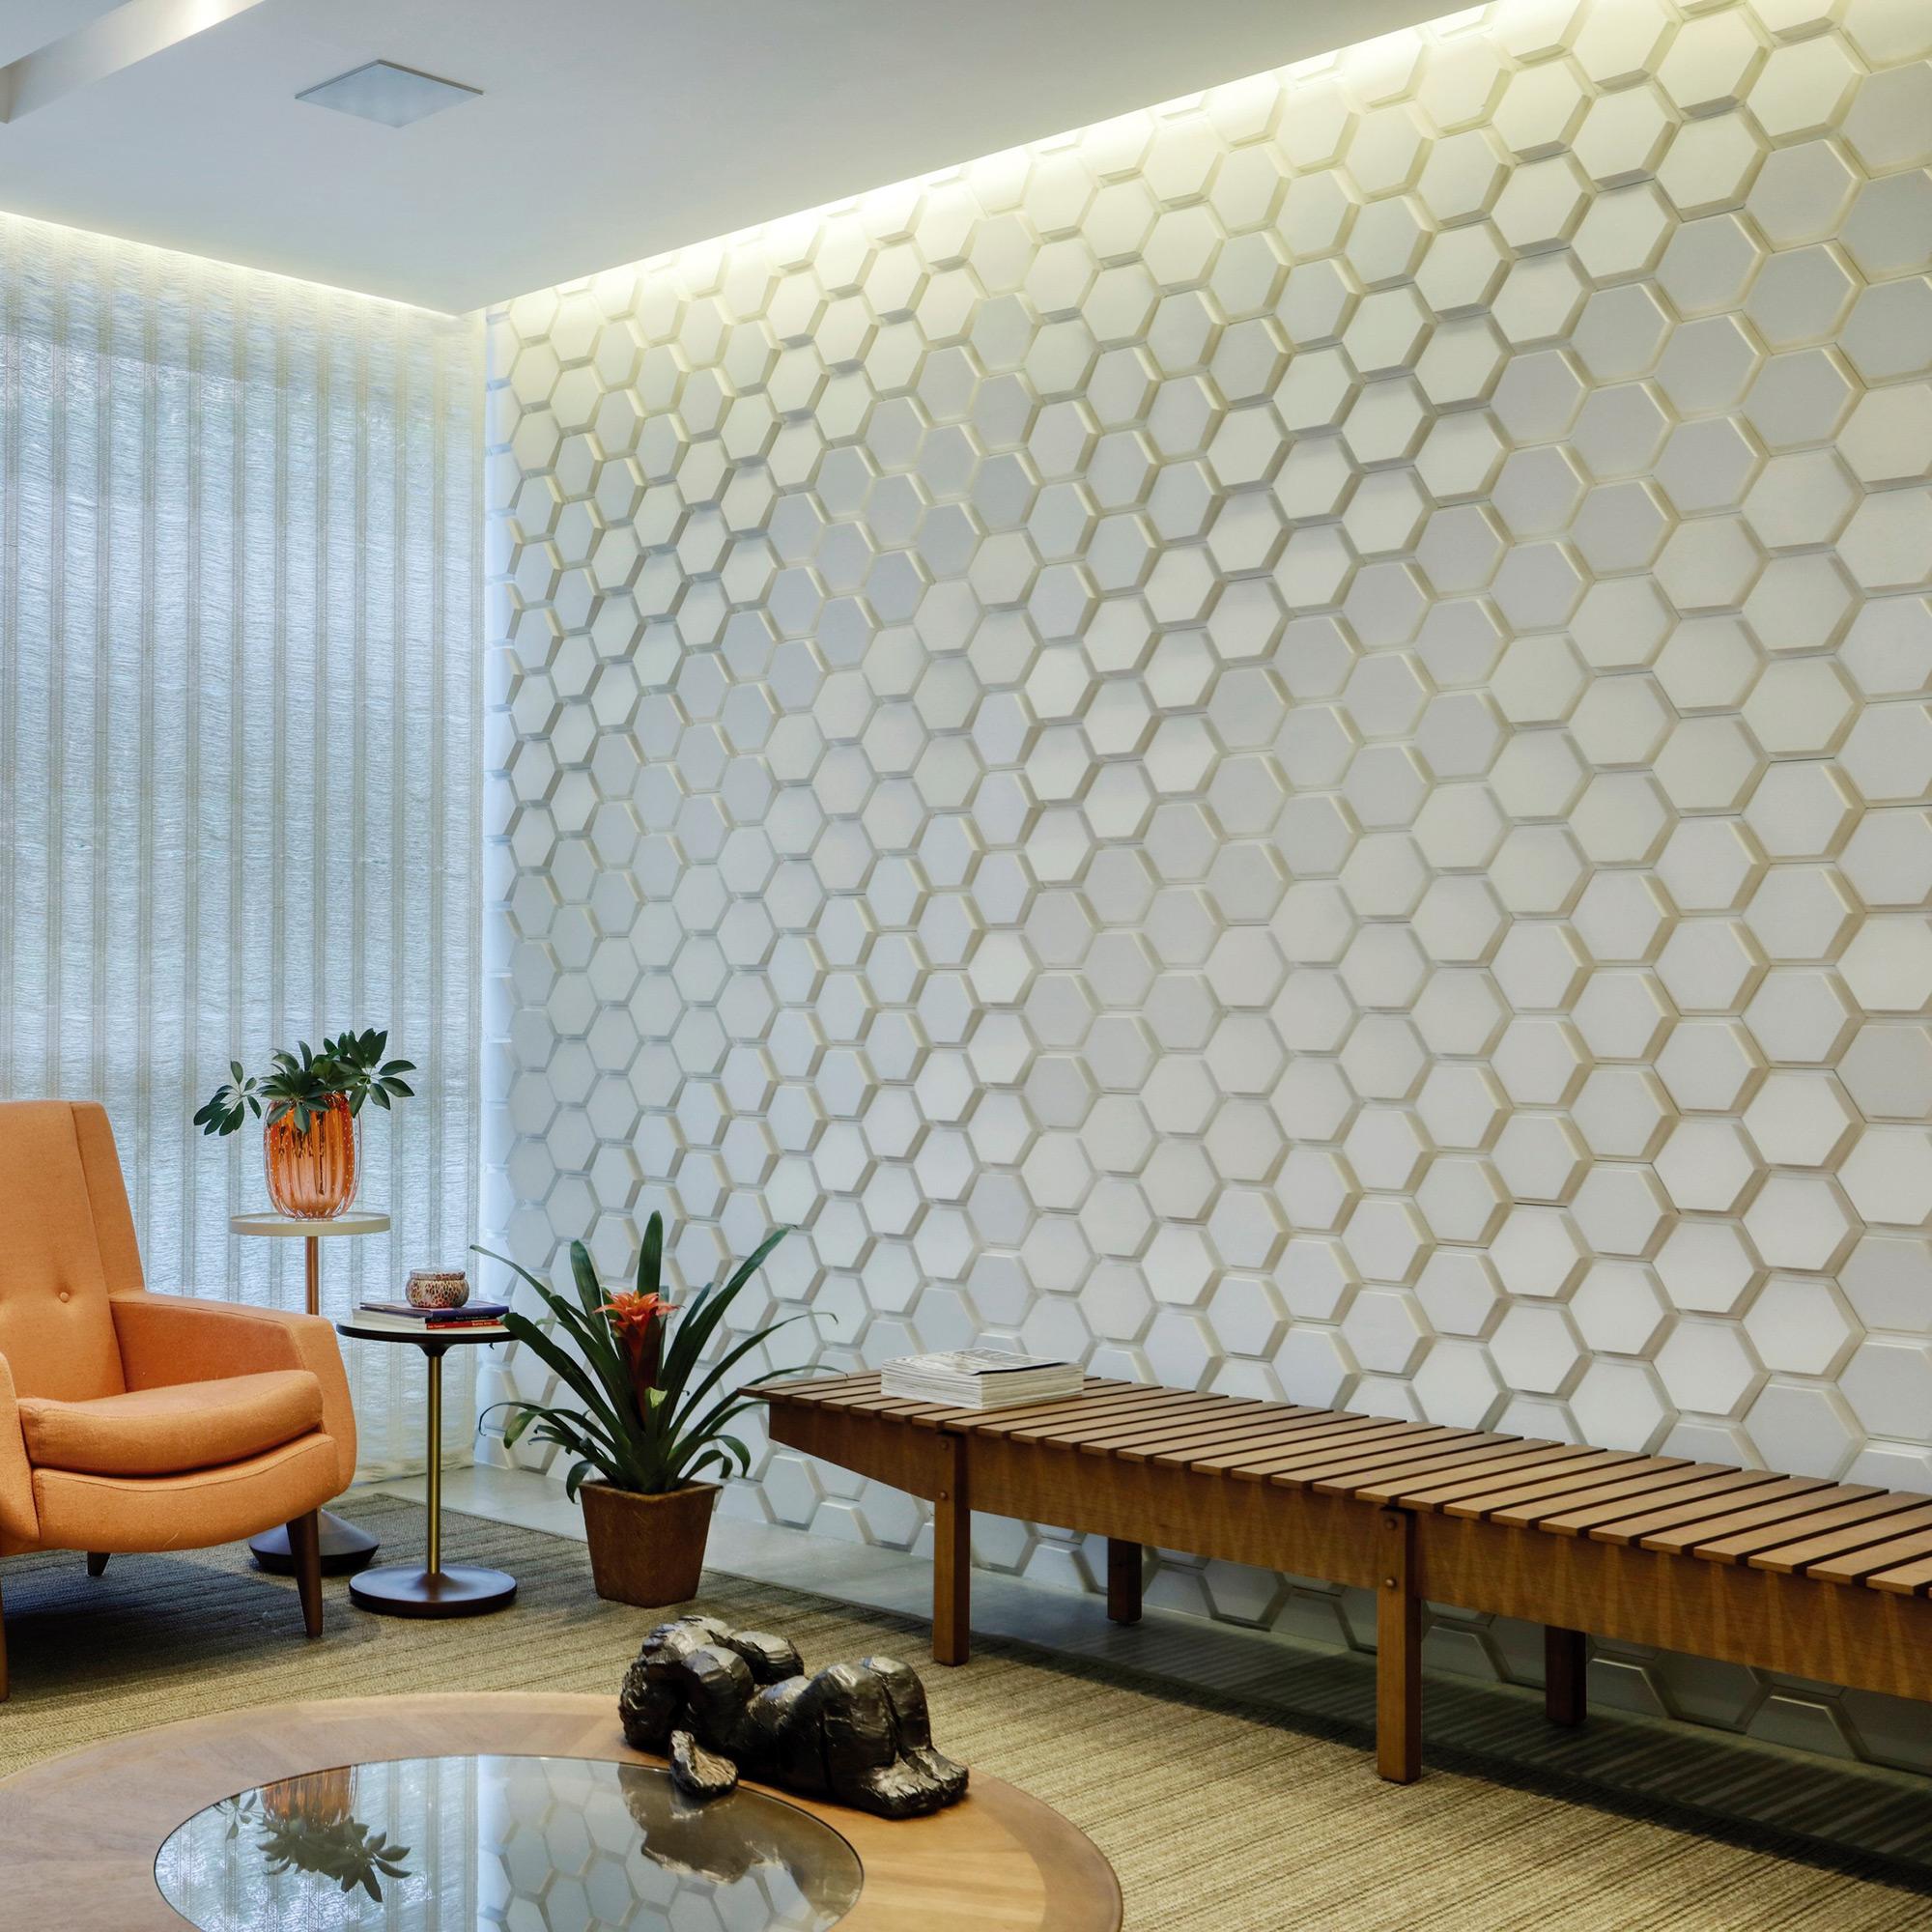 Polygon Paris Branco - Arquiteta Renata Buischi - Foto Denilson Machado